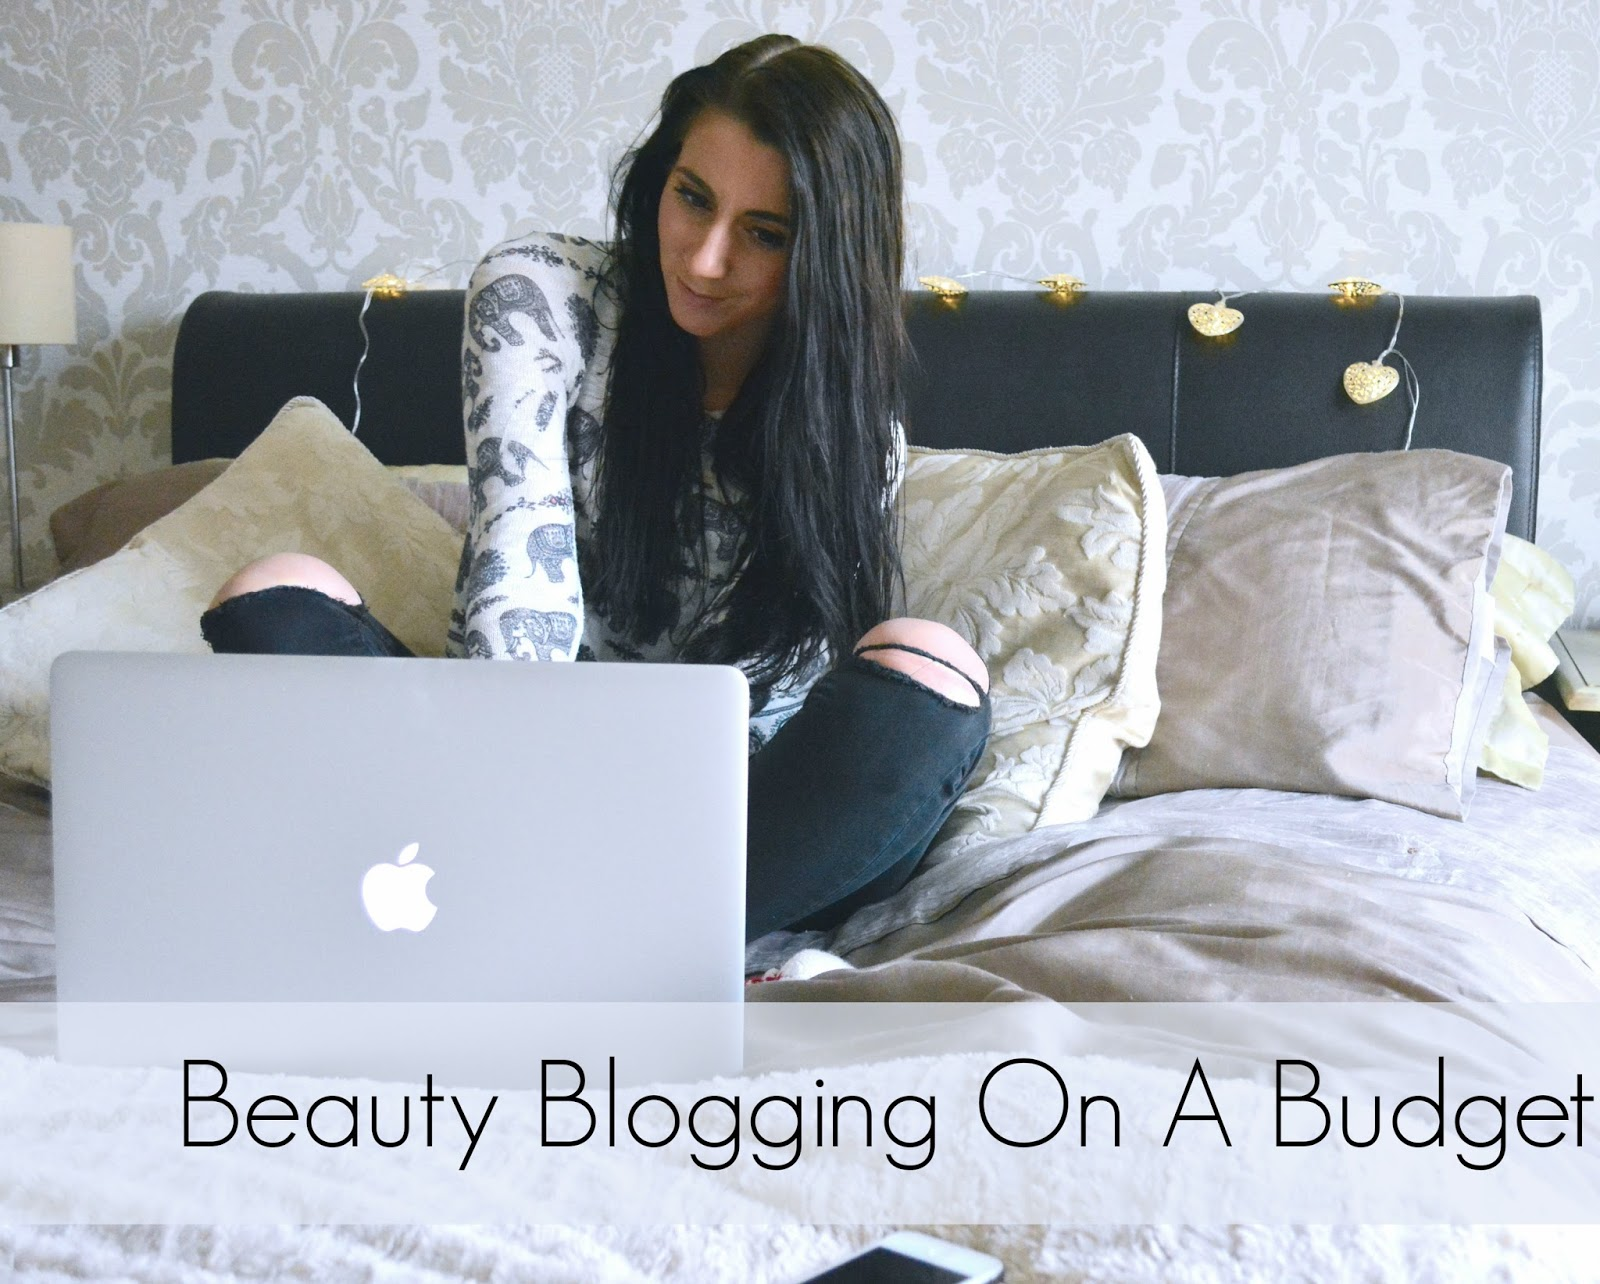 Beauty Blogging On A Budget - My Top Post Ideas, Beauty Reviews, Beauty Tags, Wish Lists, Purse Friendly Blogging Ideas, Beauty Blogger